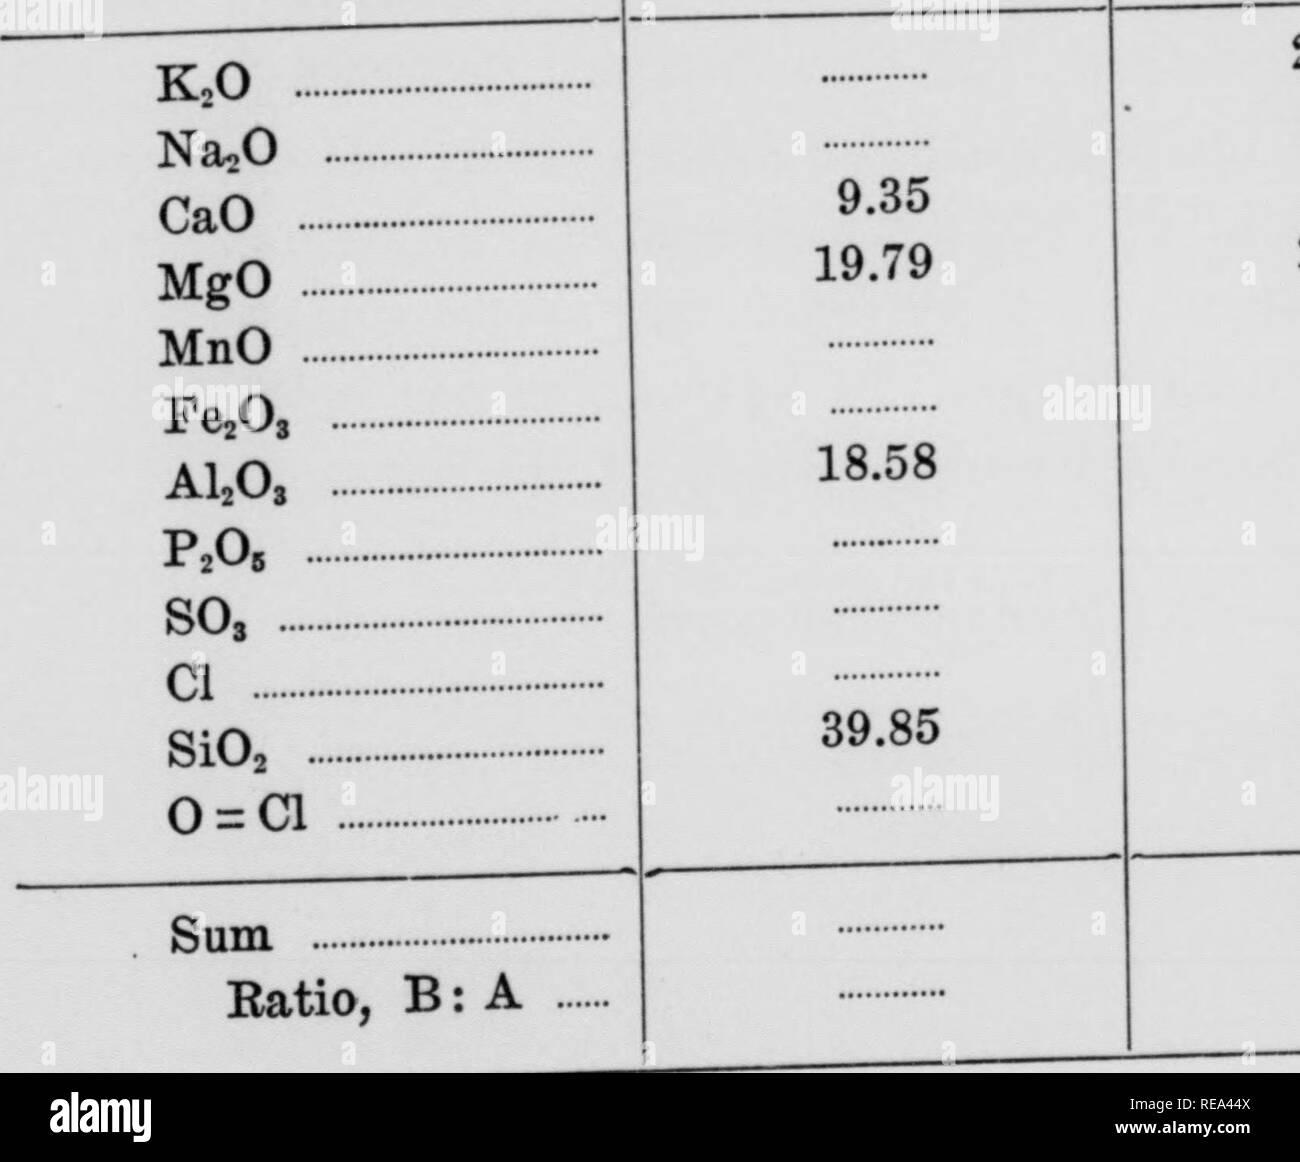 08 11 92 Stock Photos & 08 11 92 Stock Images - Alamy